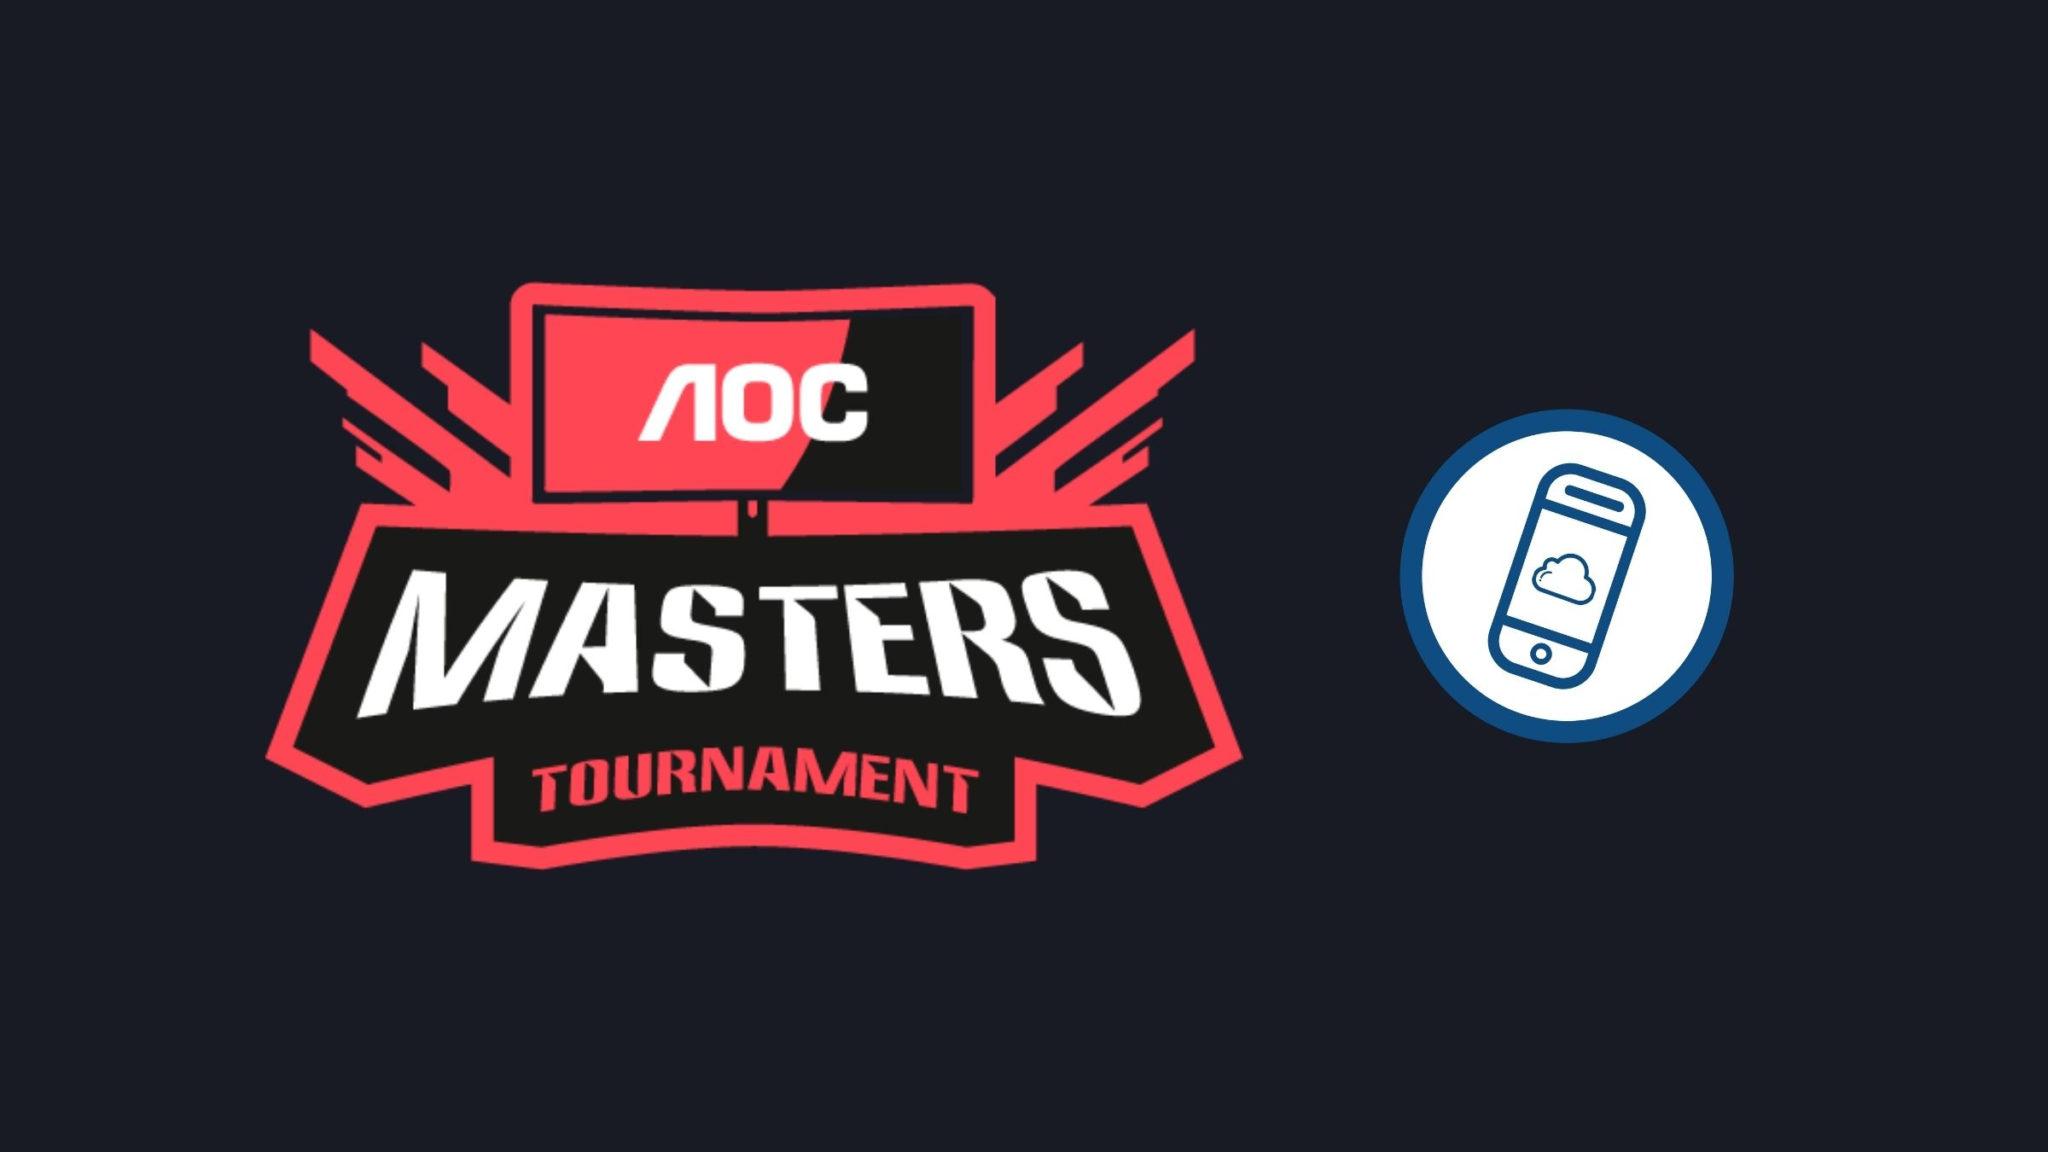 AOC Masters Tournament Header